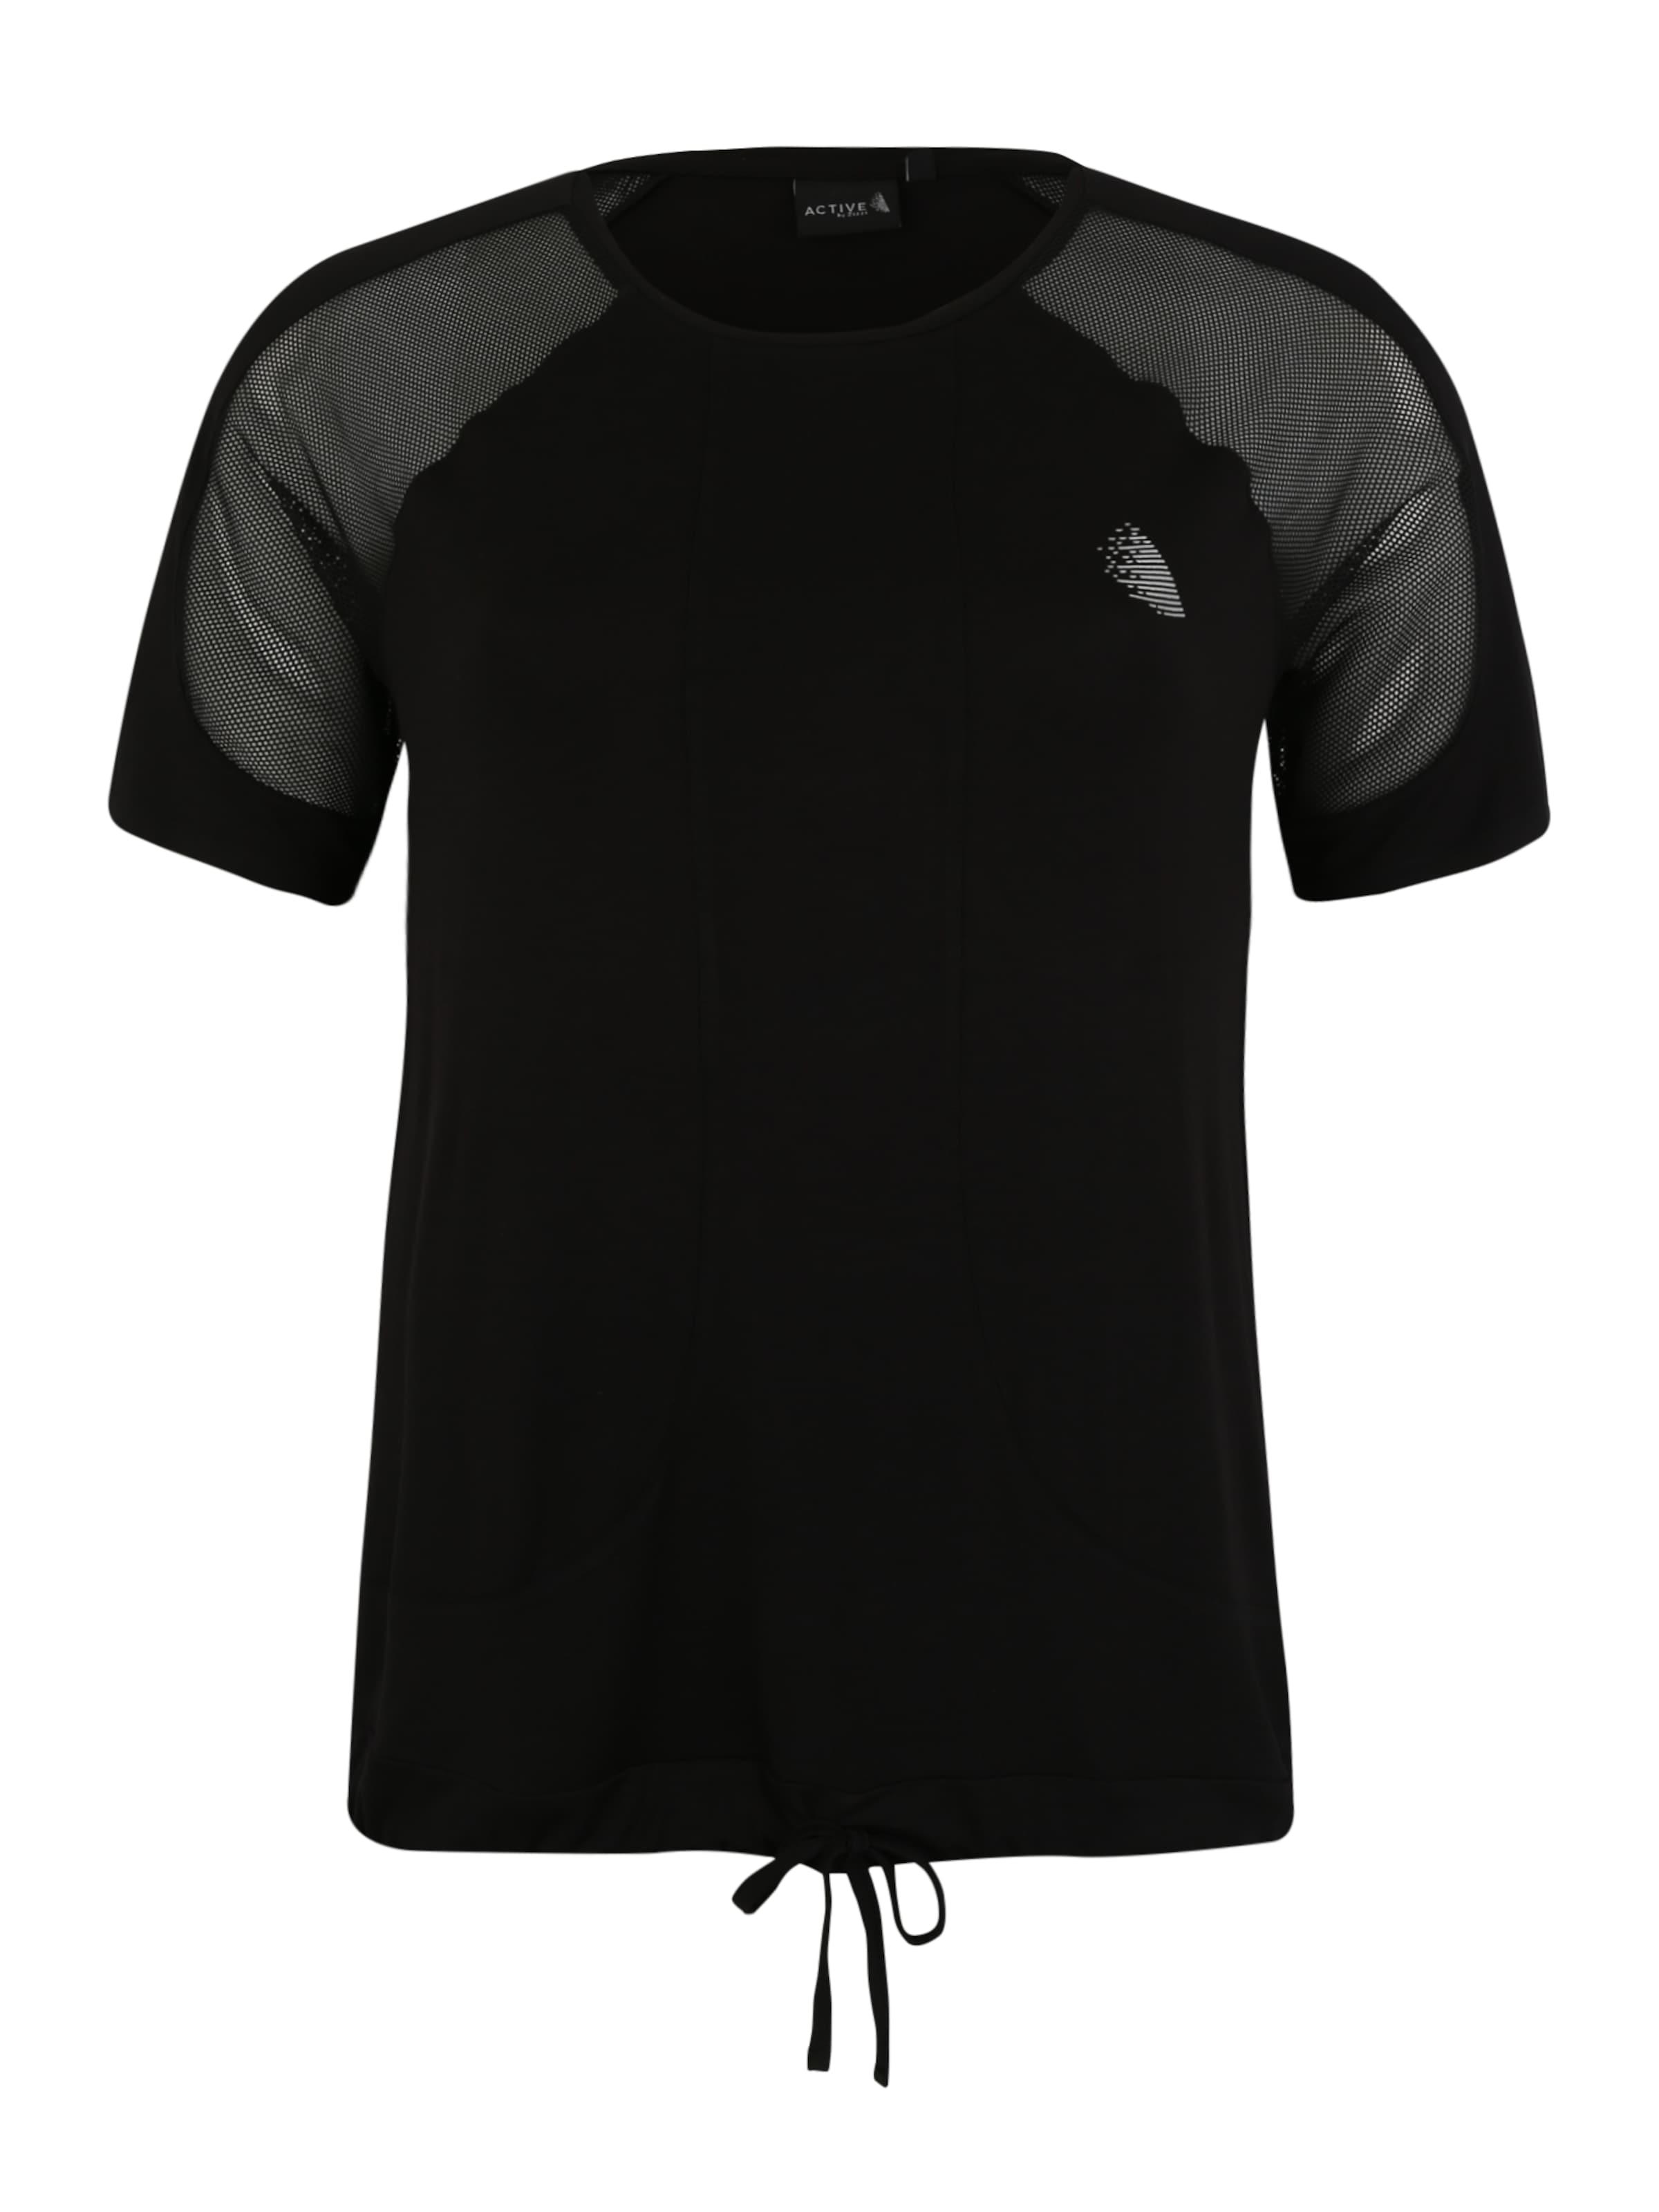 Damen Active By Zizzi Sport-Shirt  'ACADY' schwarz | 05711284977968